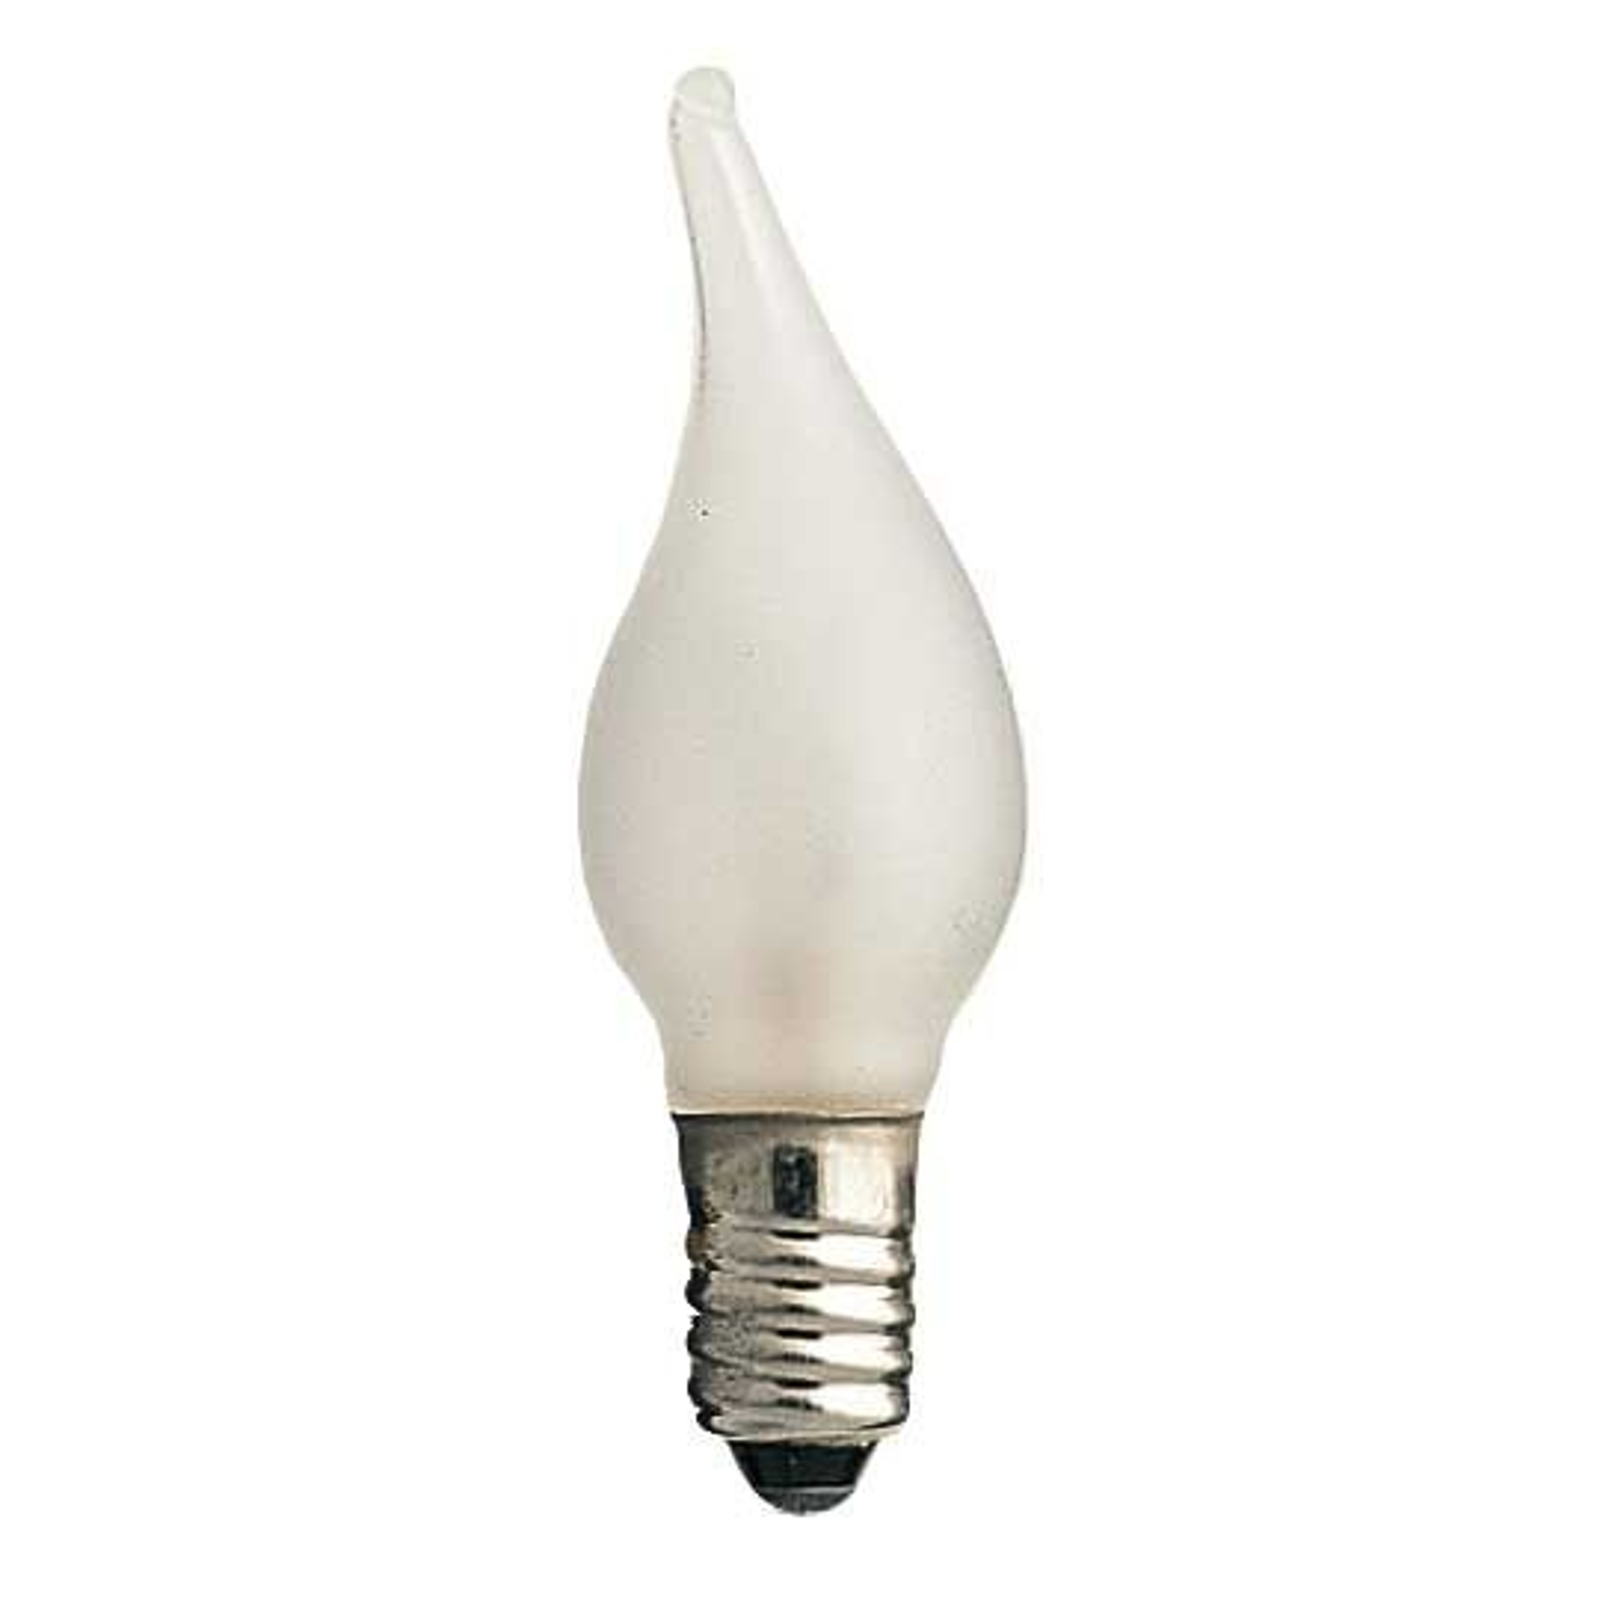 E10 3W 55V Ersatzlampen 3er Pack Windstoß